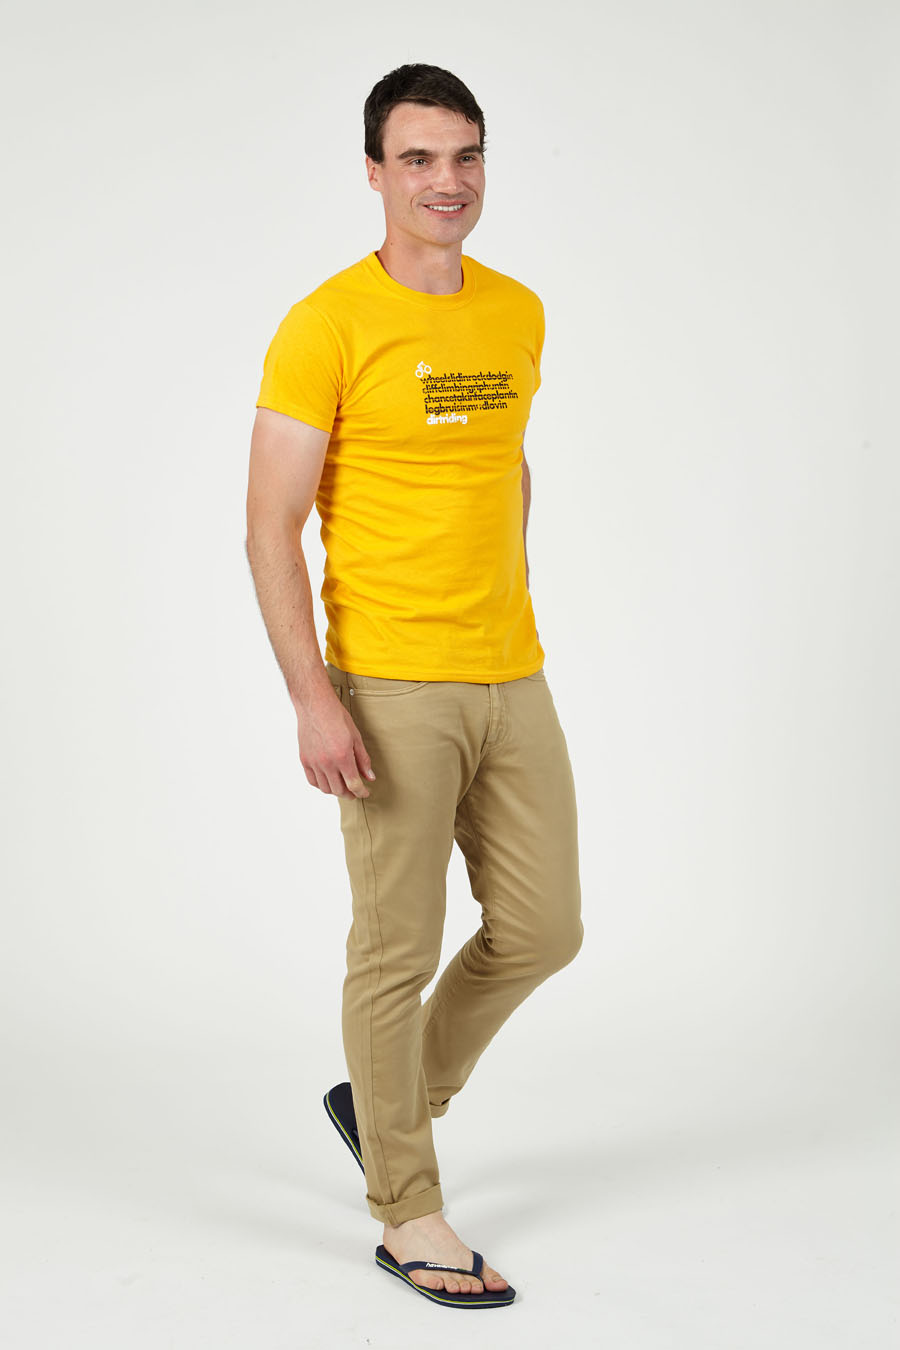 T-lab DirtRider cycling t-shirt model full